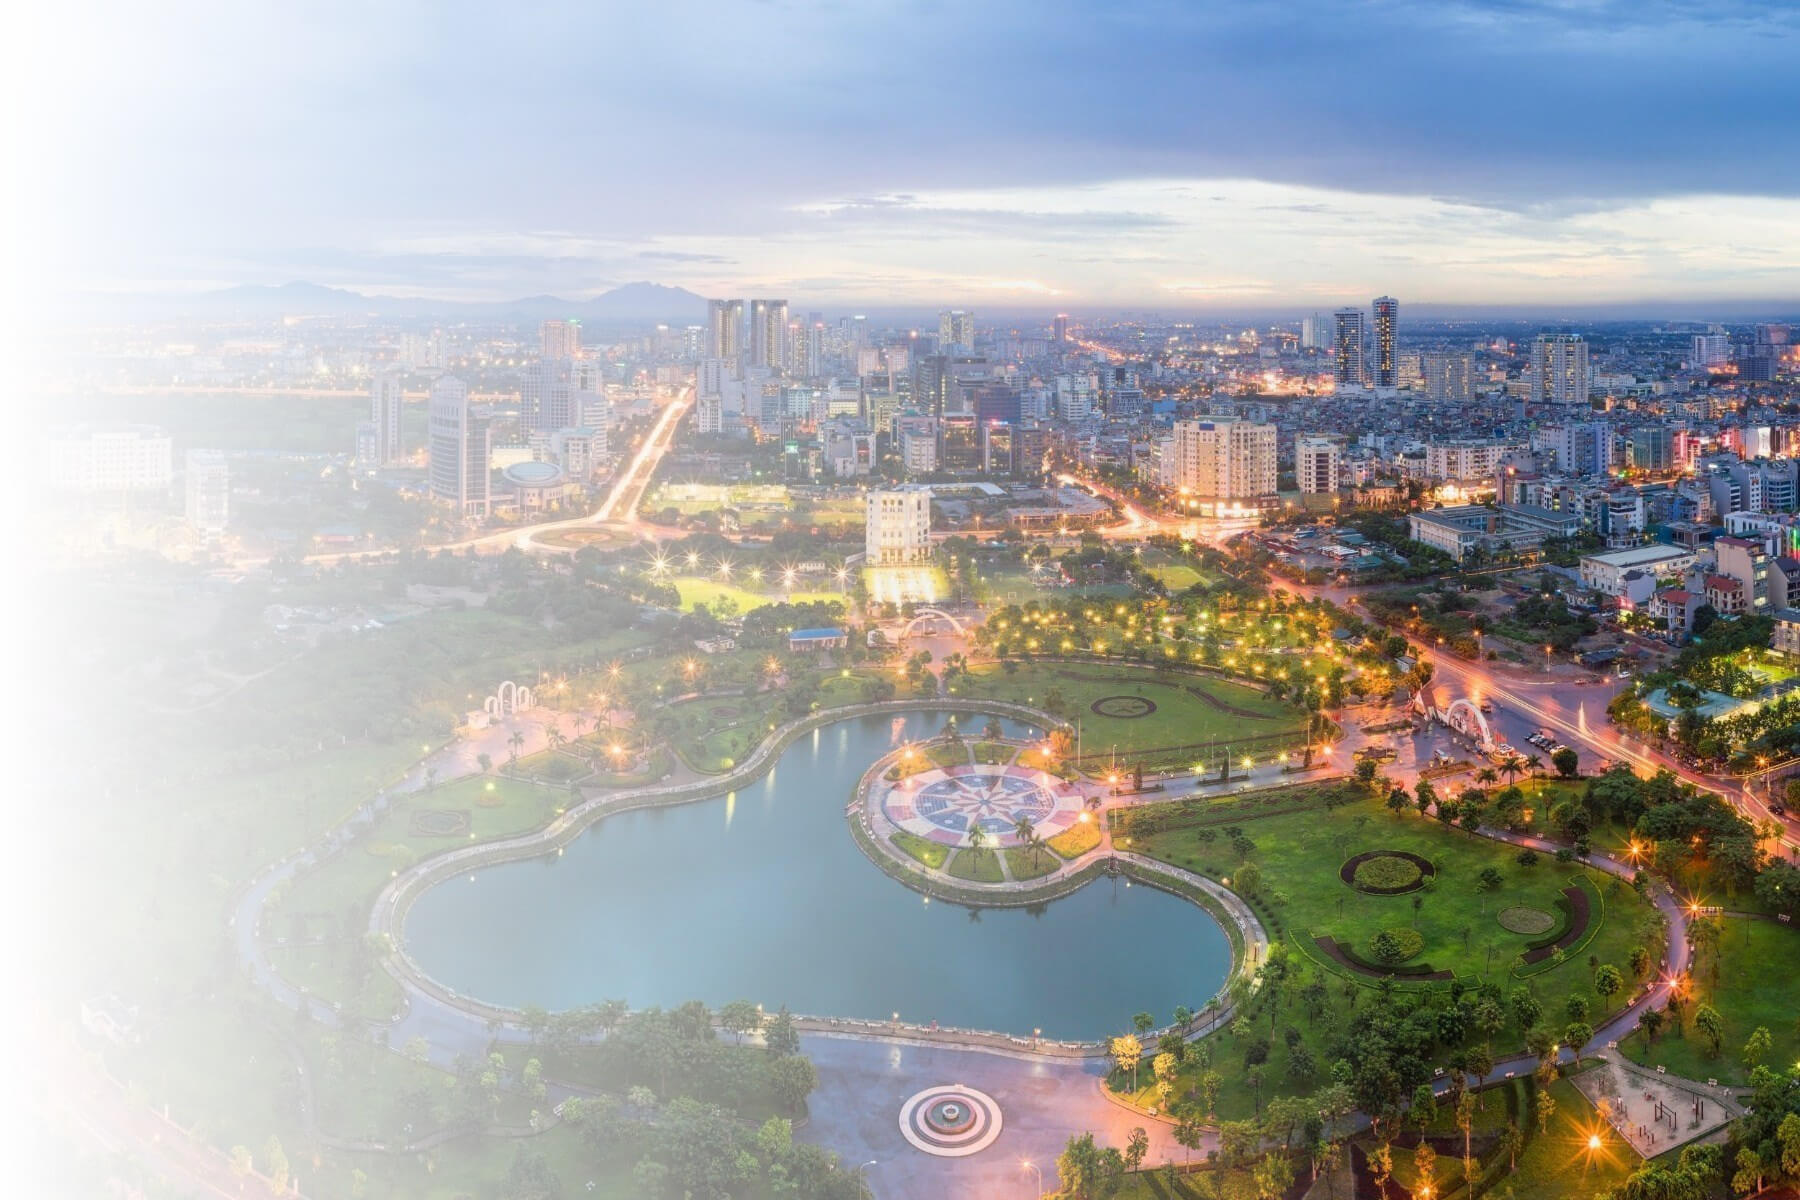 View of Hanoi skyline